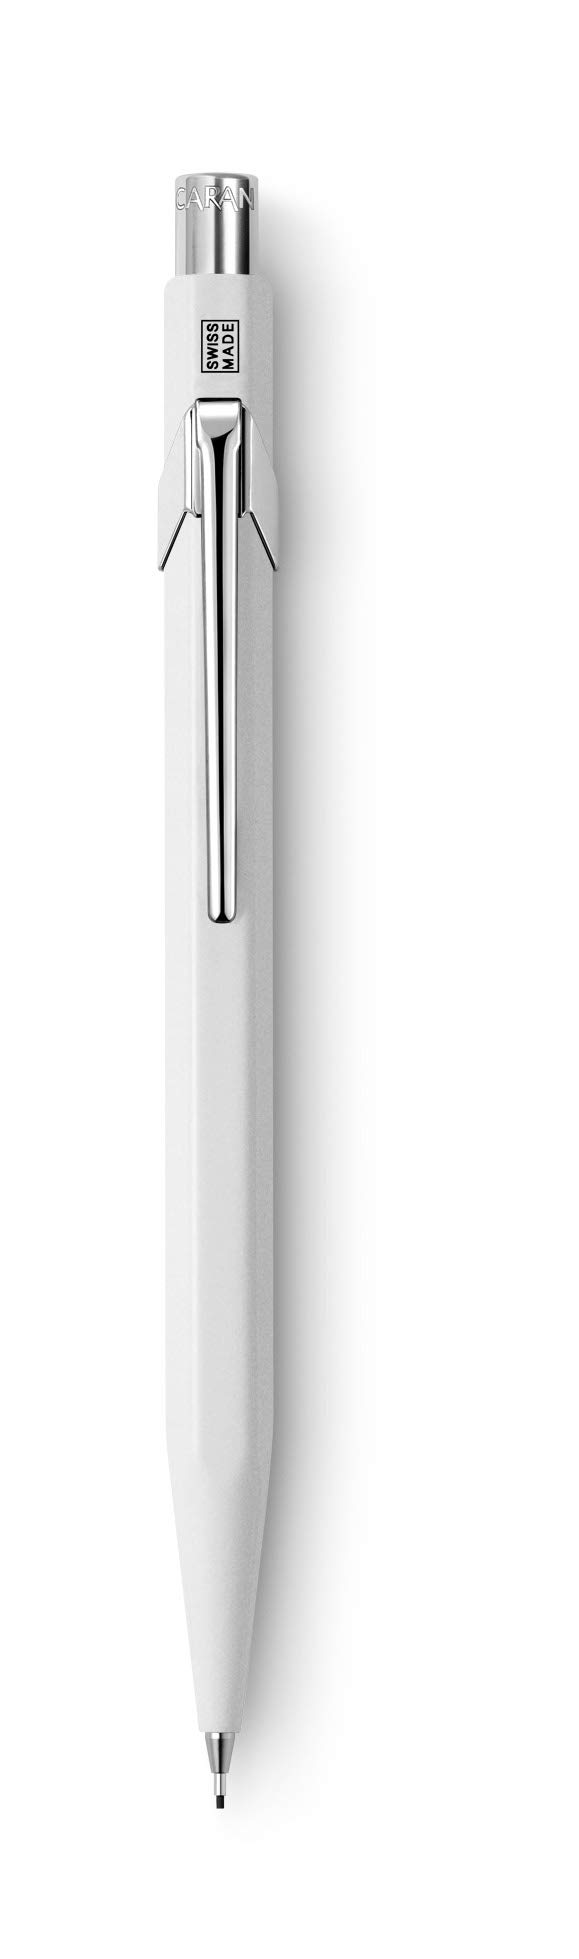 CARAN DACHE Lápiz mecánico Infinite  0.7mm blanco